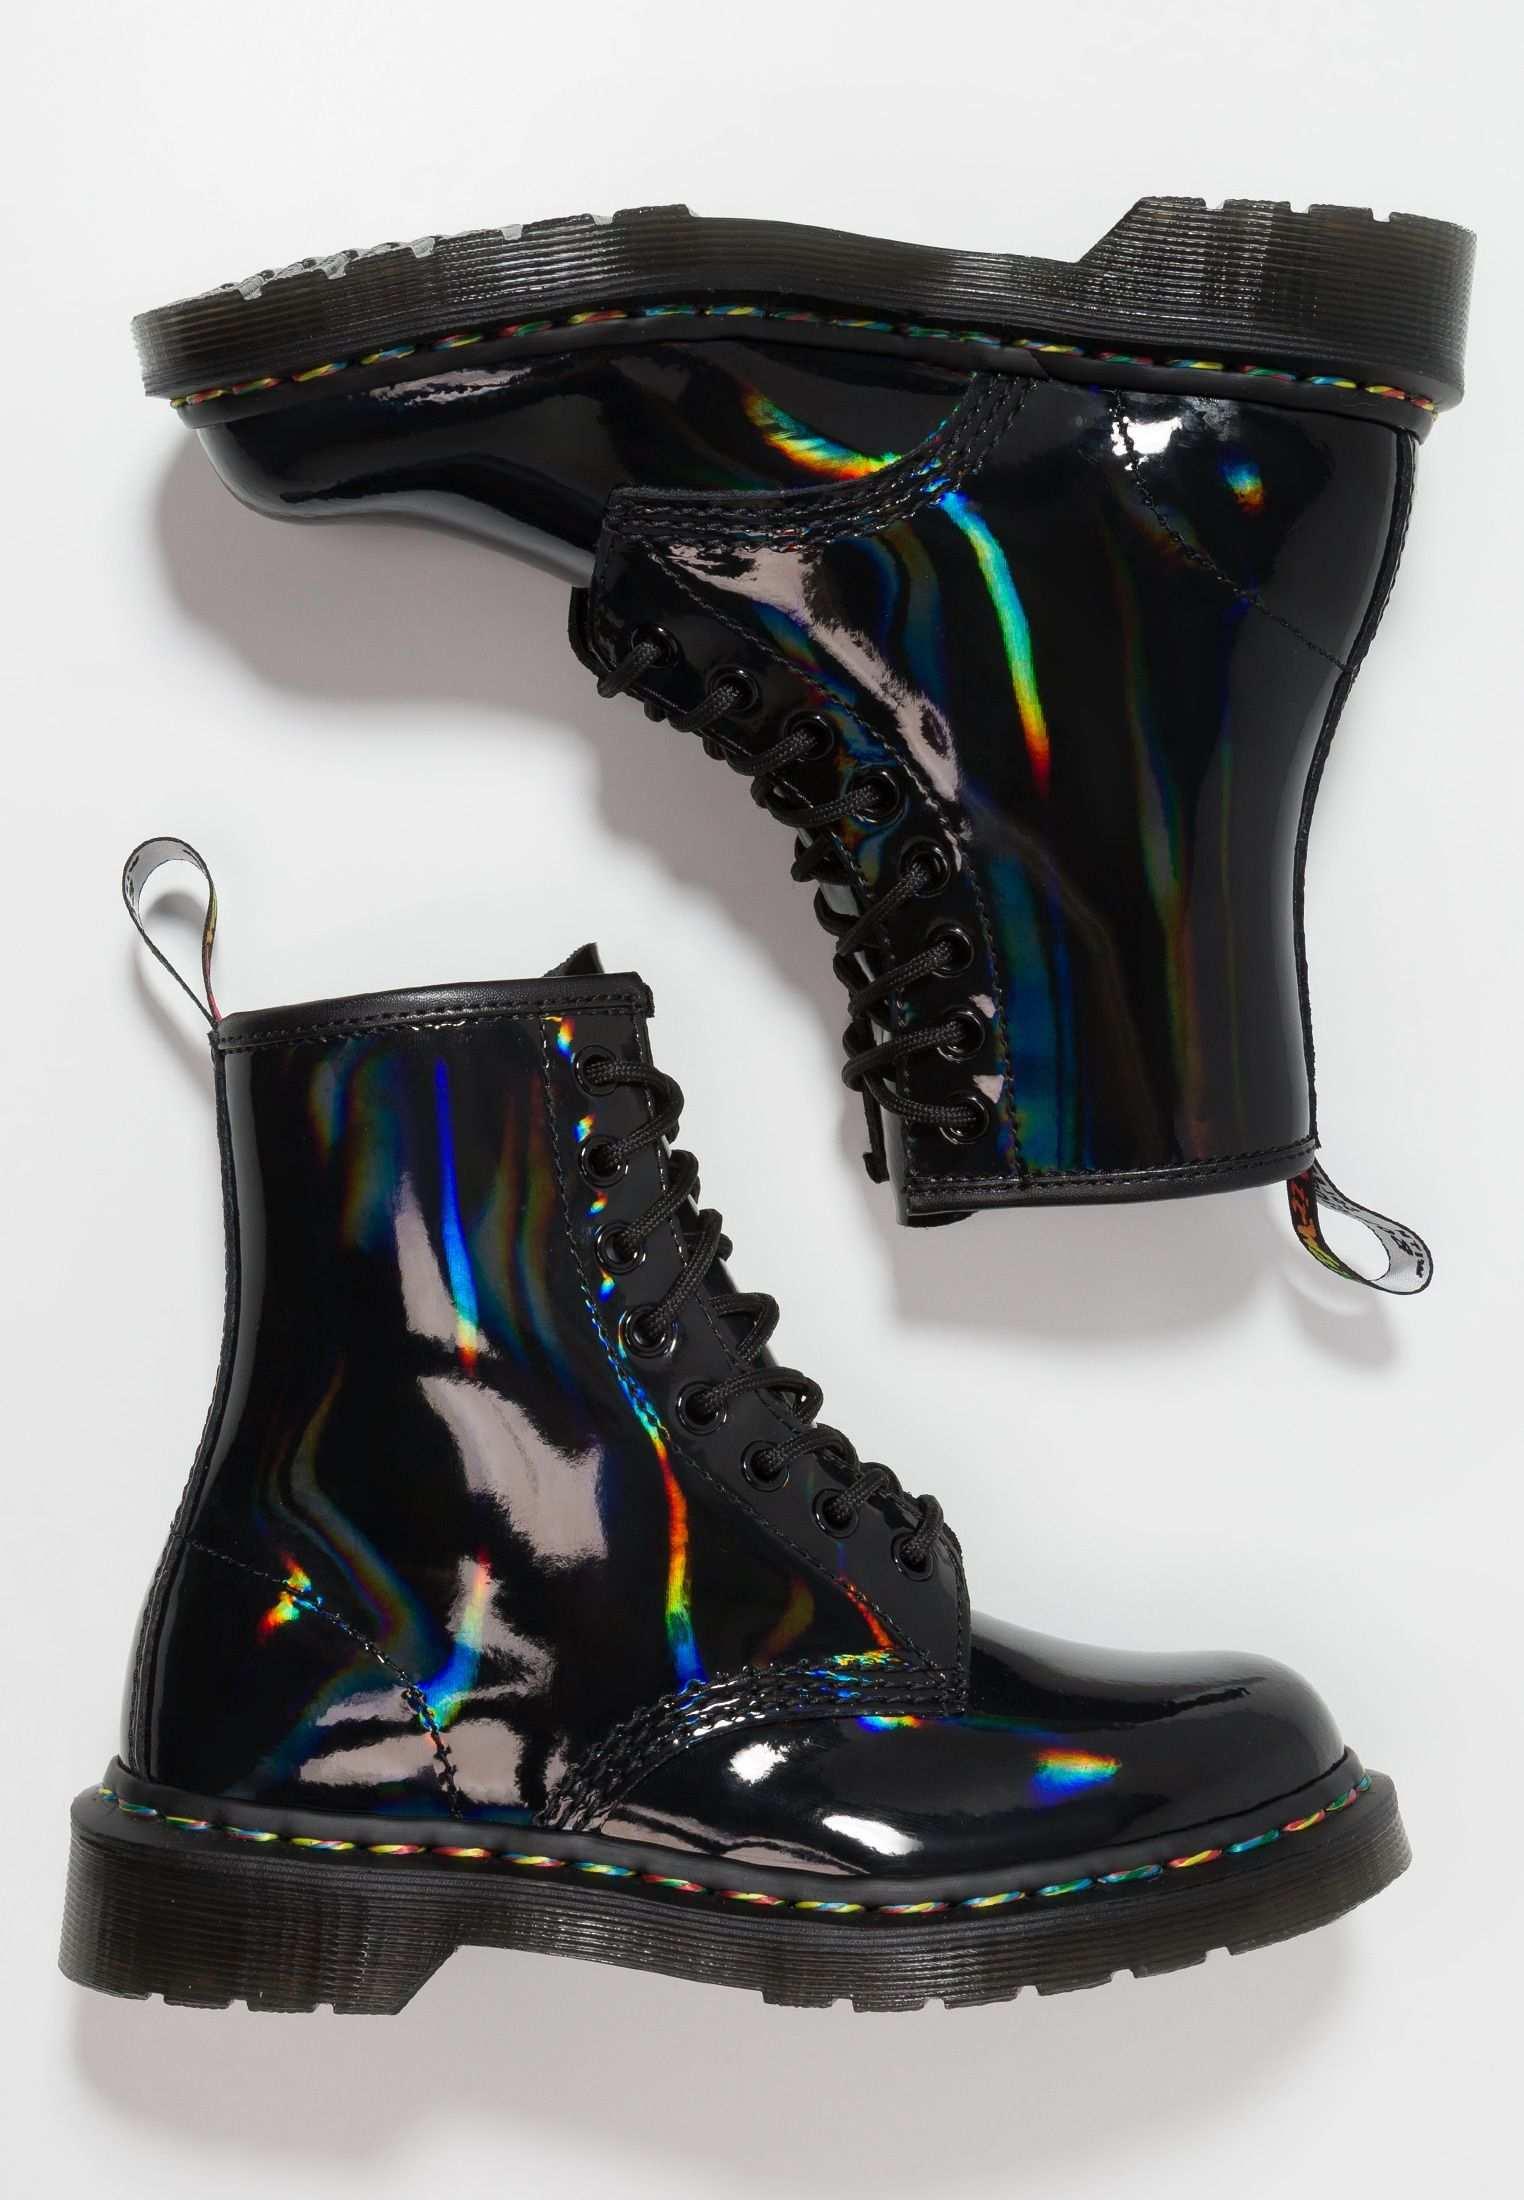 Dr Martens 1460 Rainbow Iridescent Bottines A Lacets Black Zalando Fr Festival Shoes Boots Casual Shoes Outfit